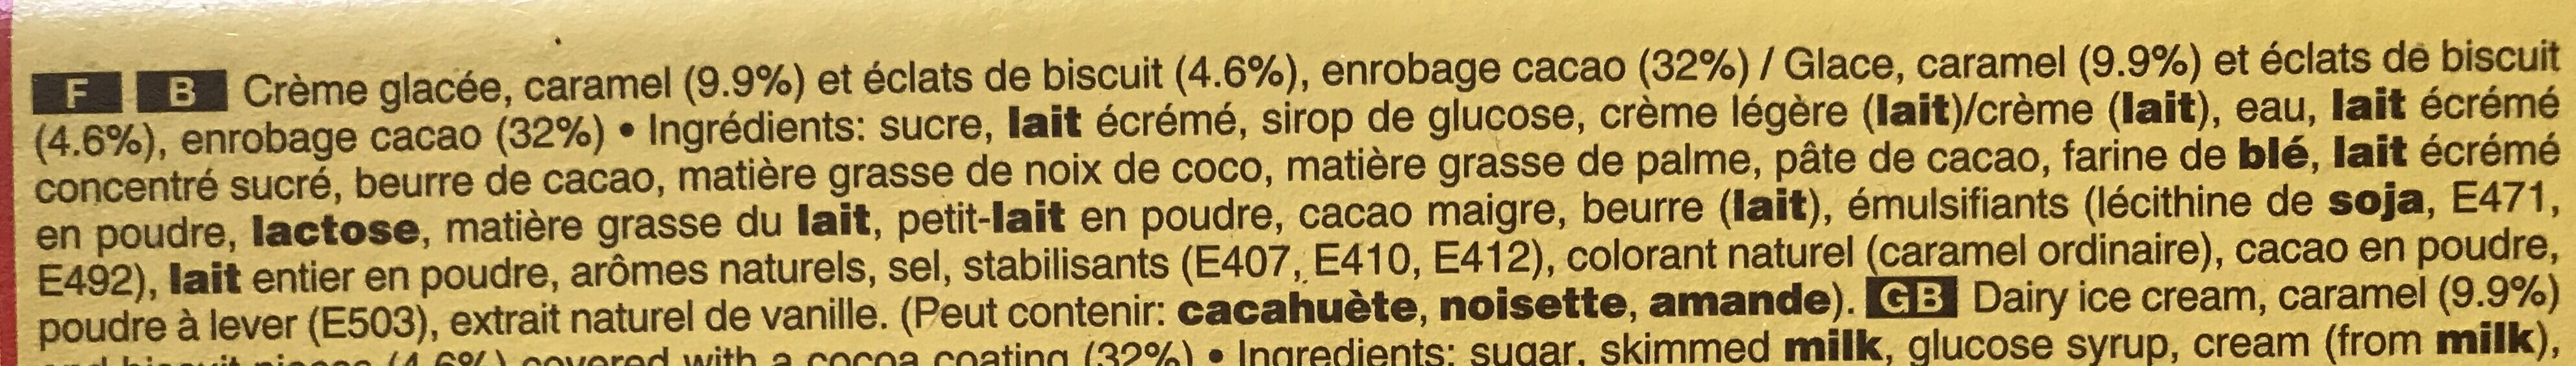 Barre glacee twix x10 - Ingrédients - fr